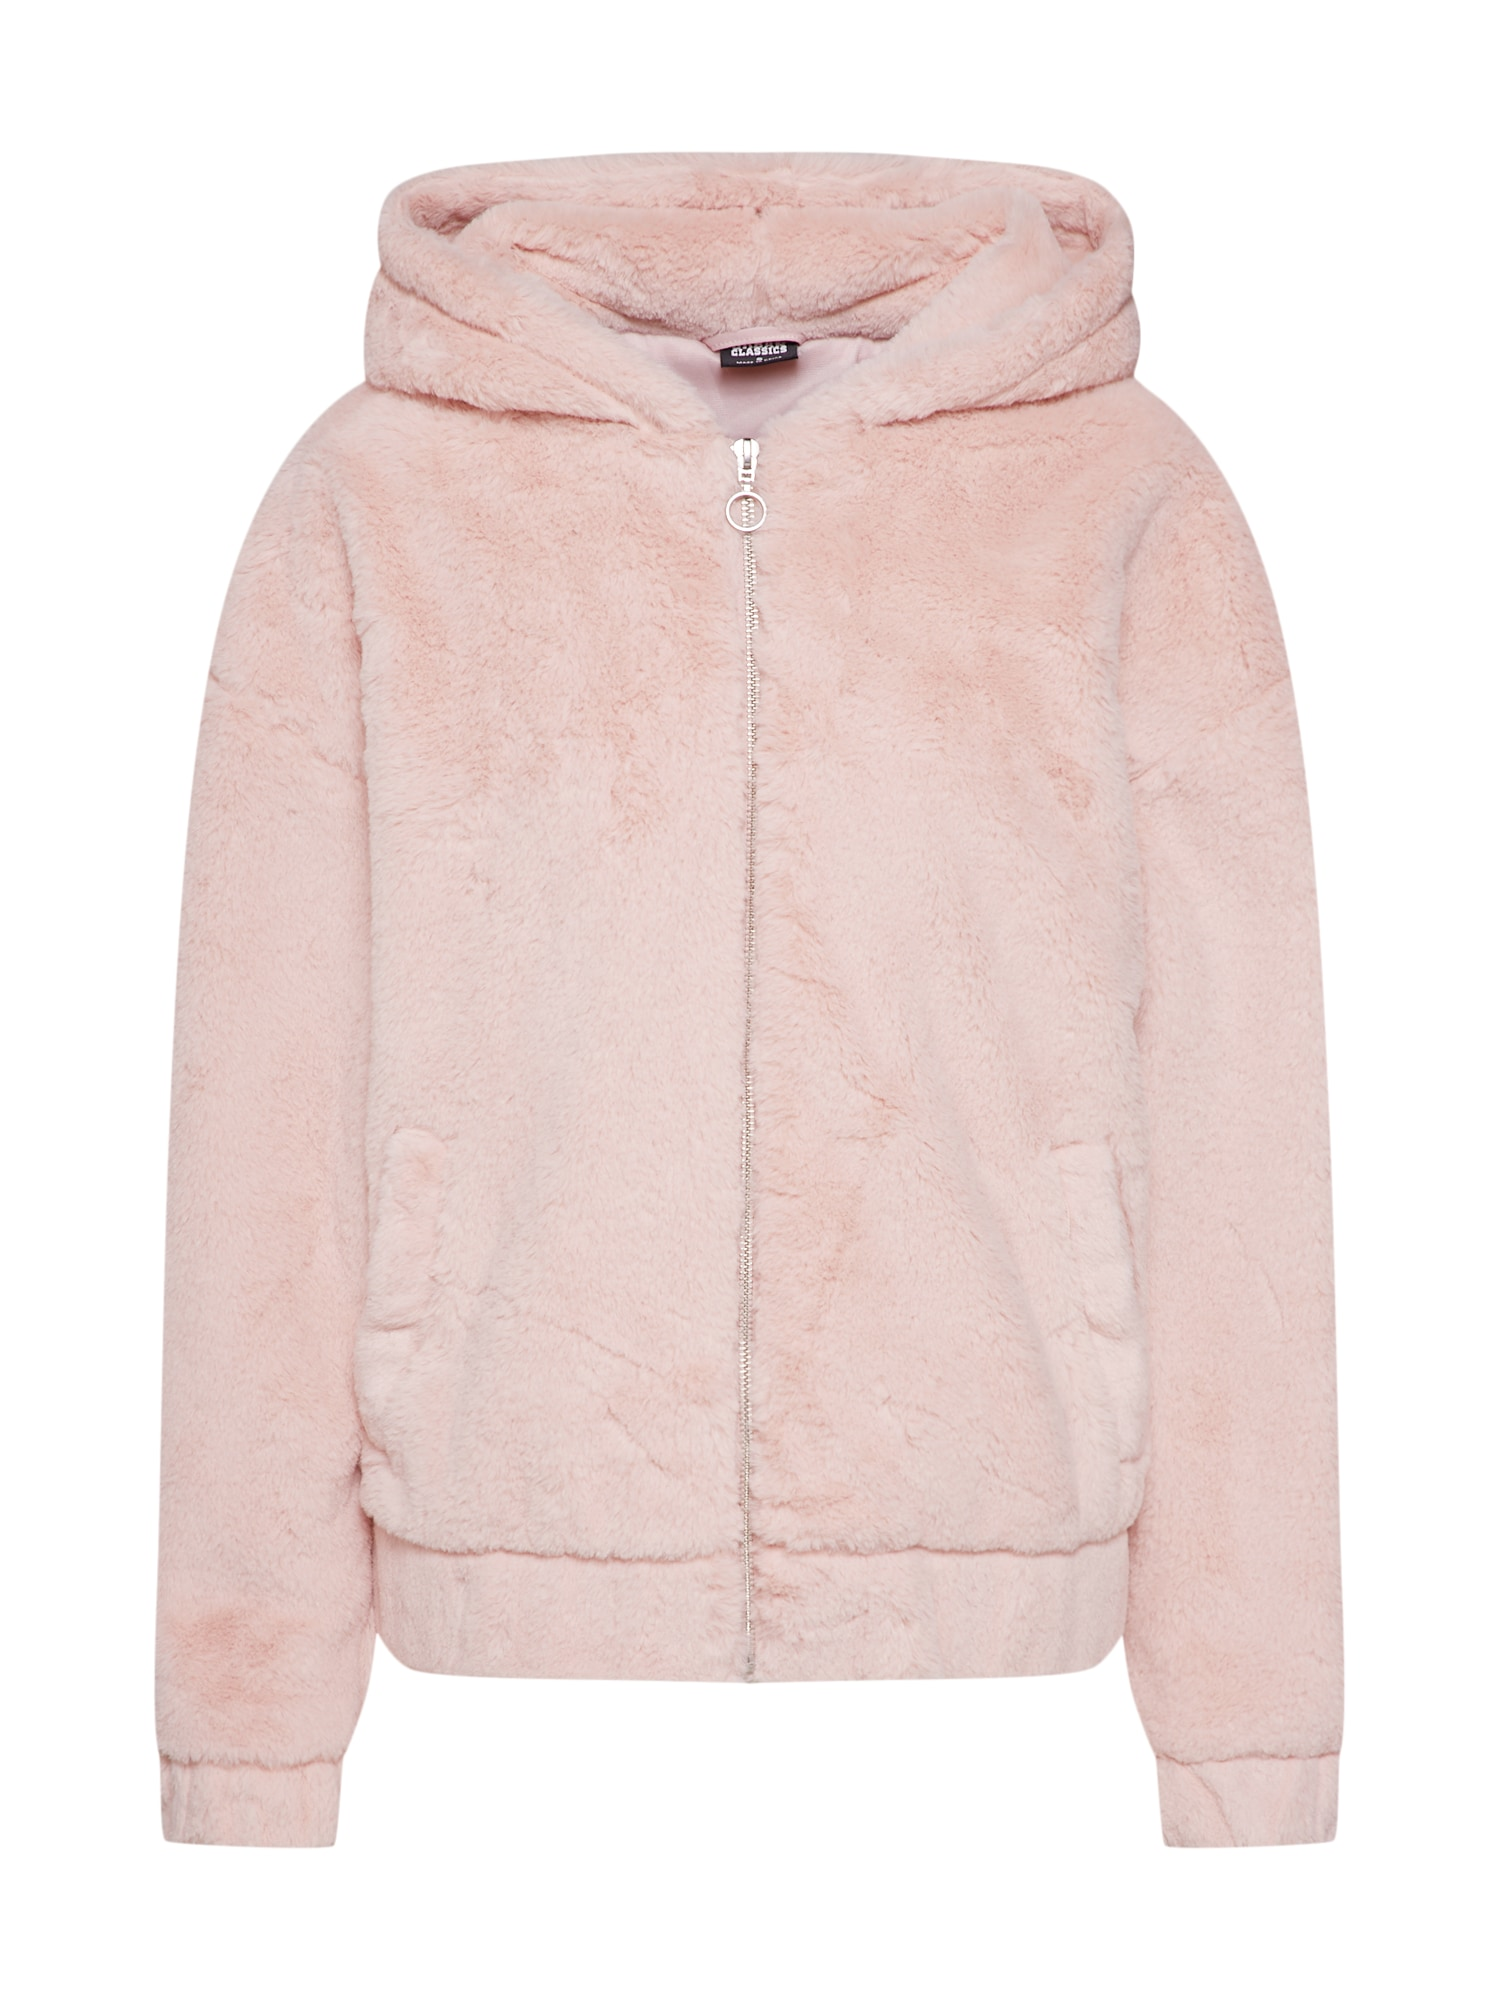 Urban Classics Mikina s kapucí 'Ladies Teddy Jacket'  růžová